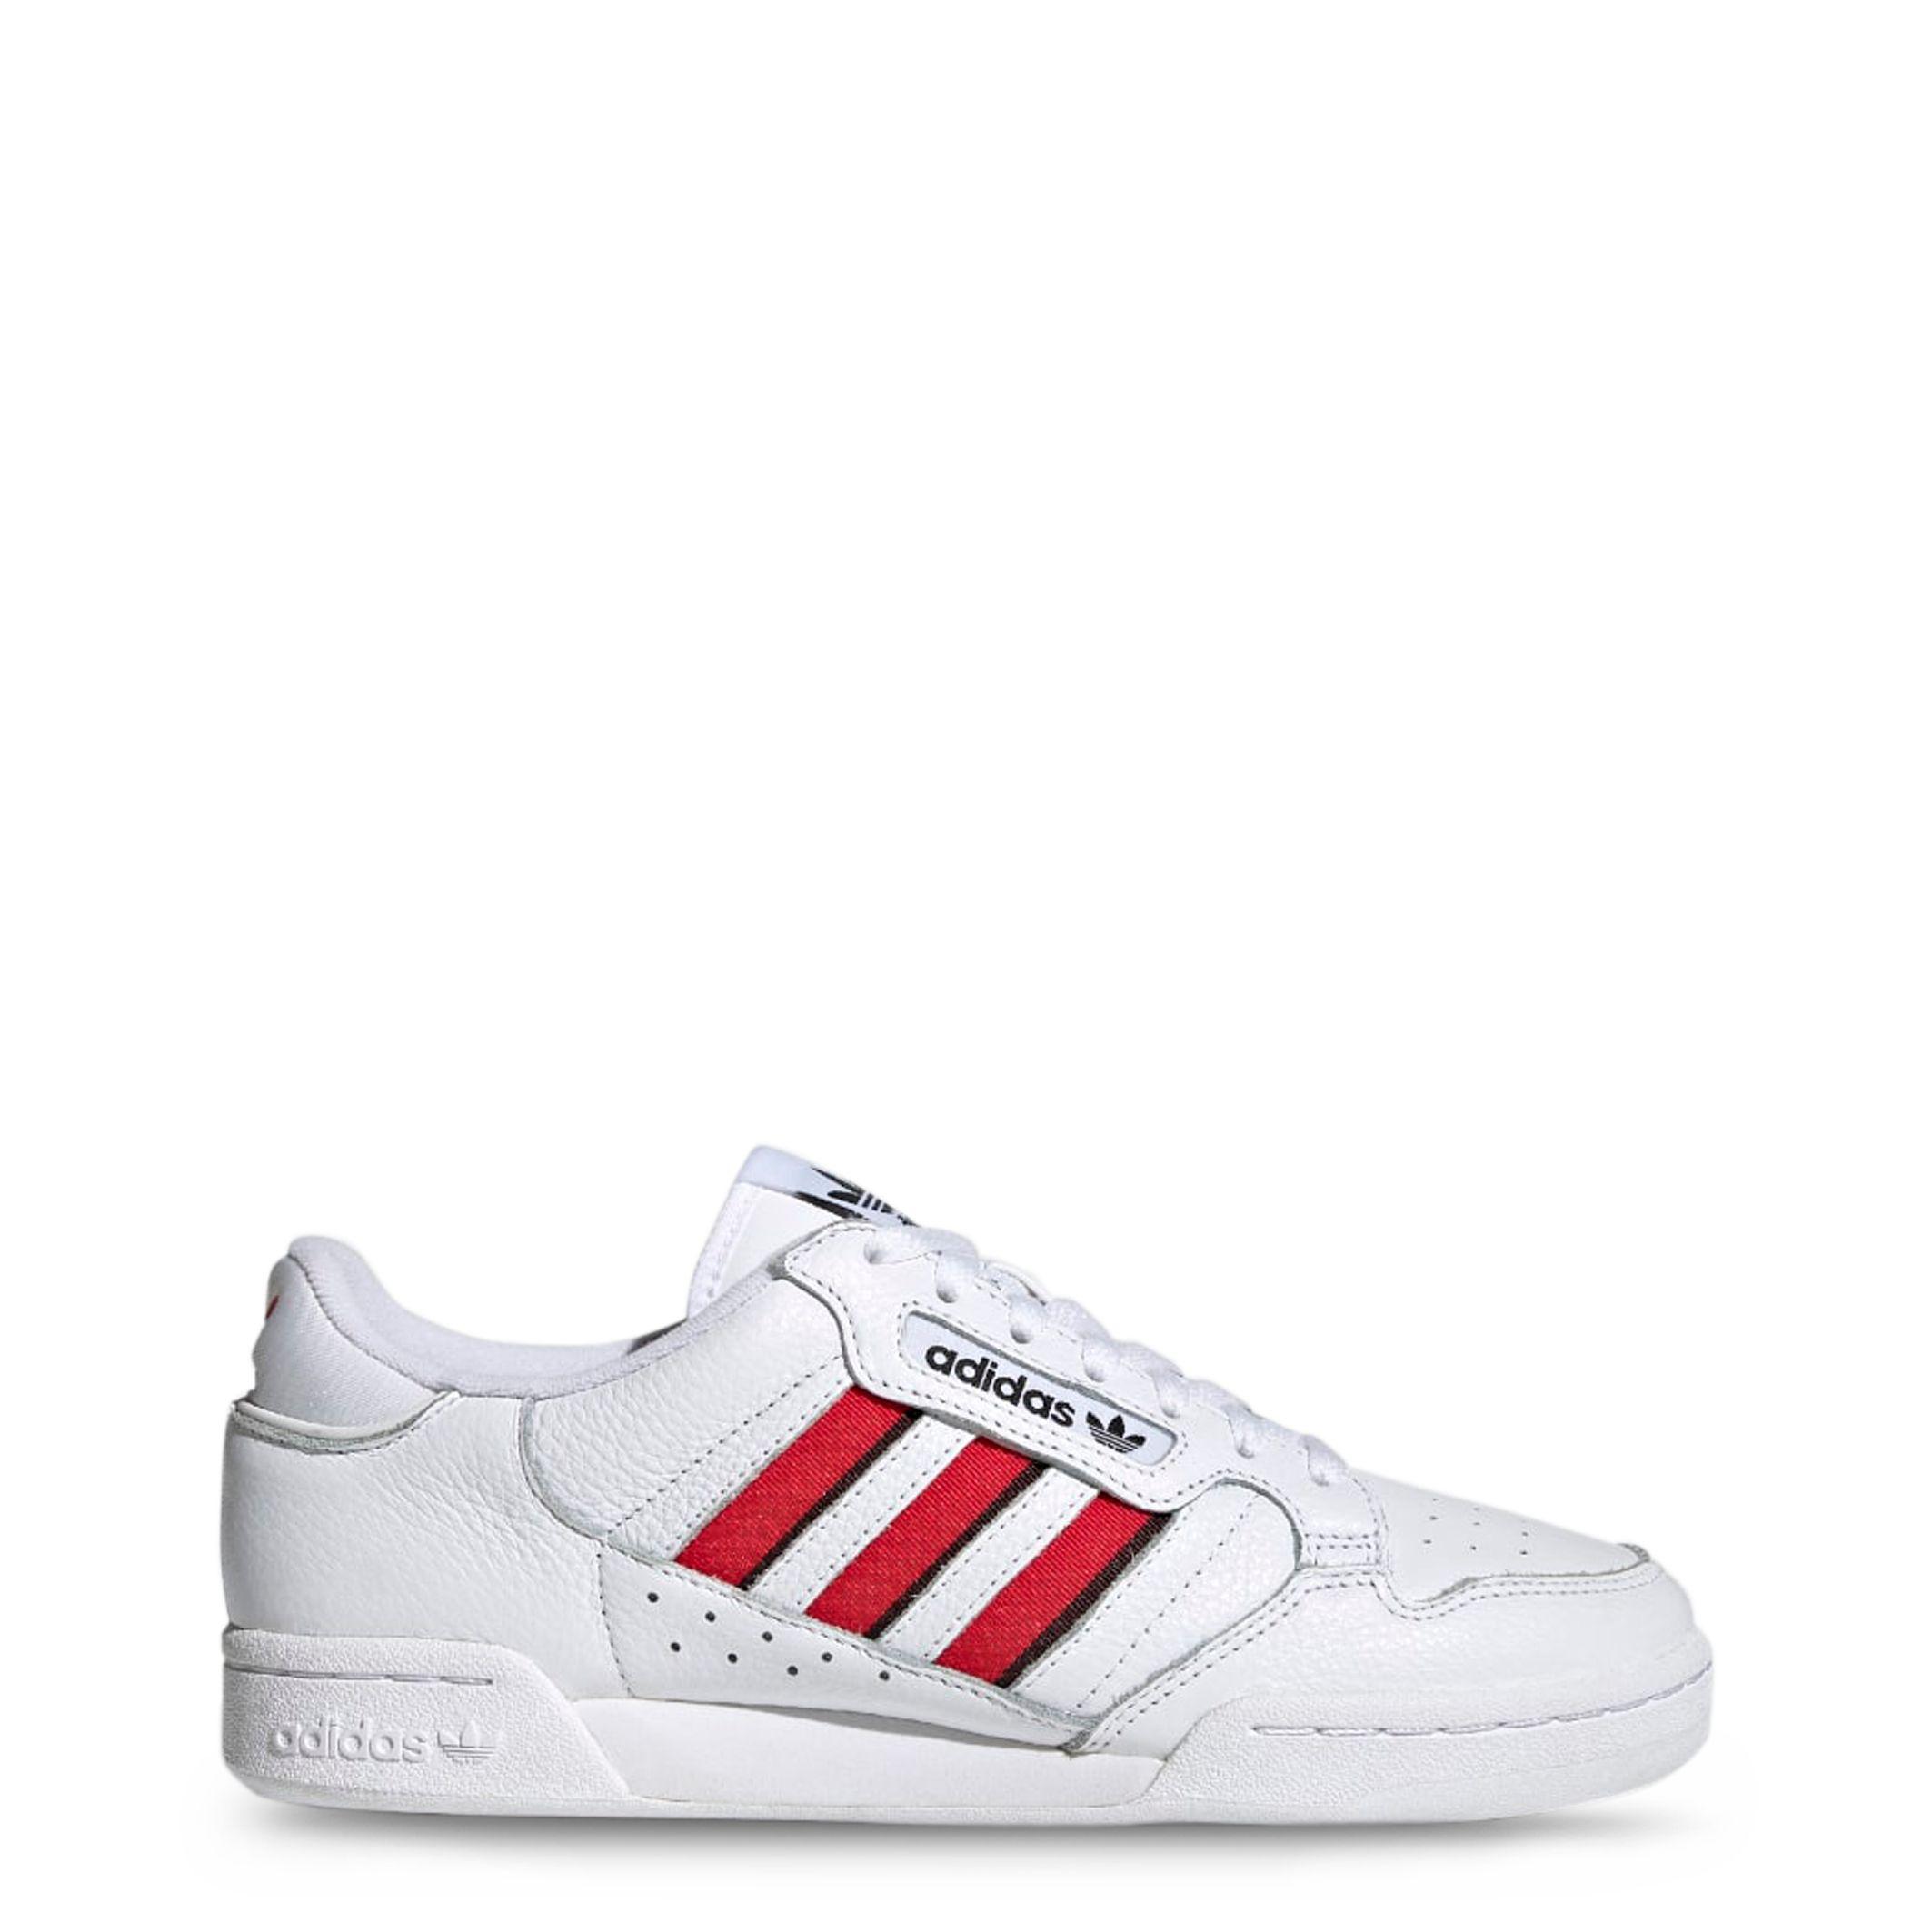 Adidas – Continental80-Stripes – Wit Designeritems.nl